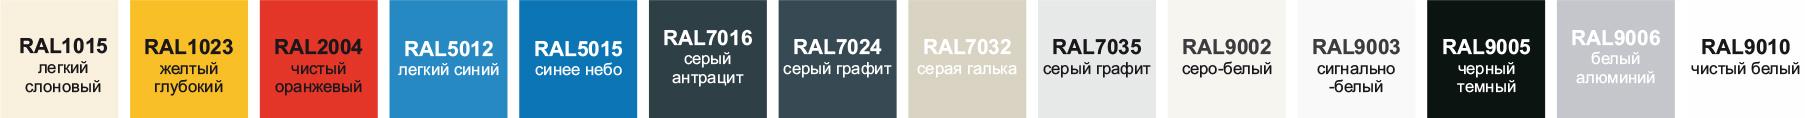 00-info_ru (2).cdr